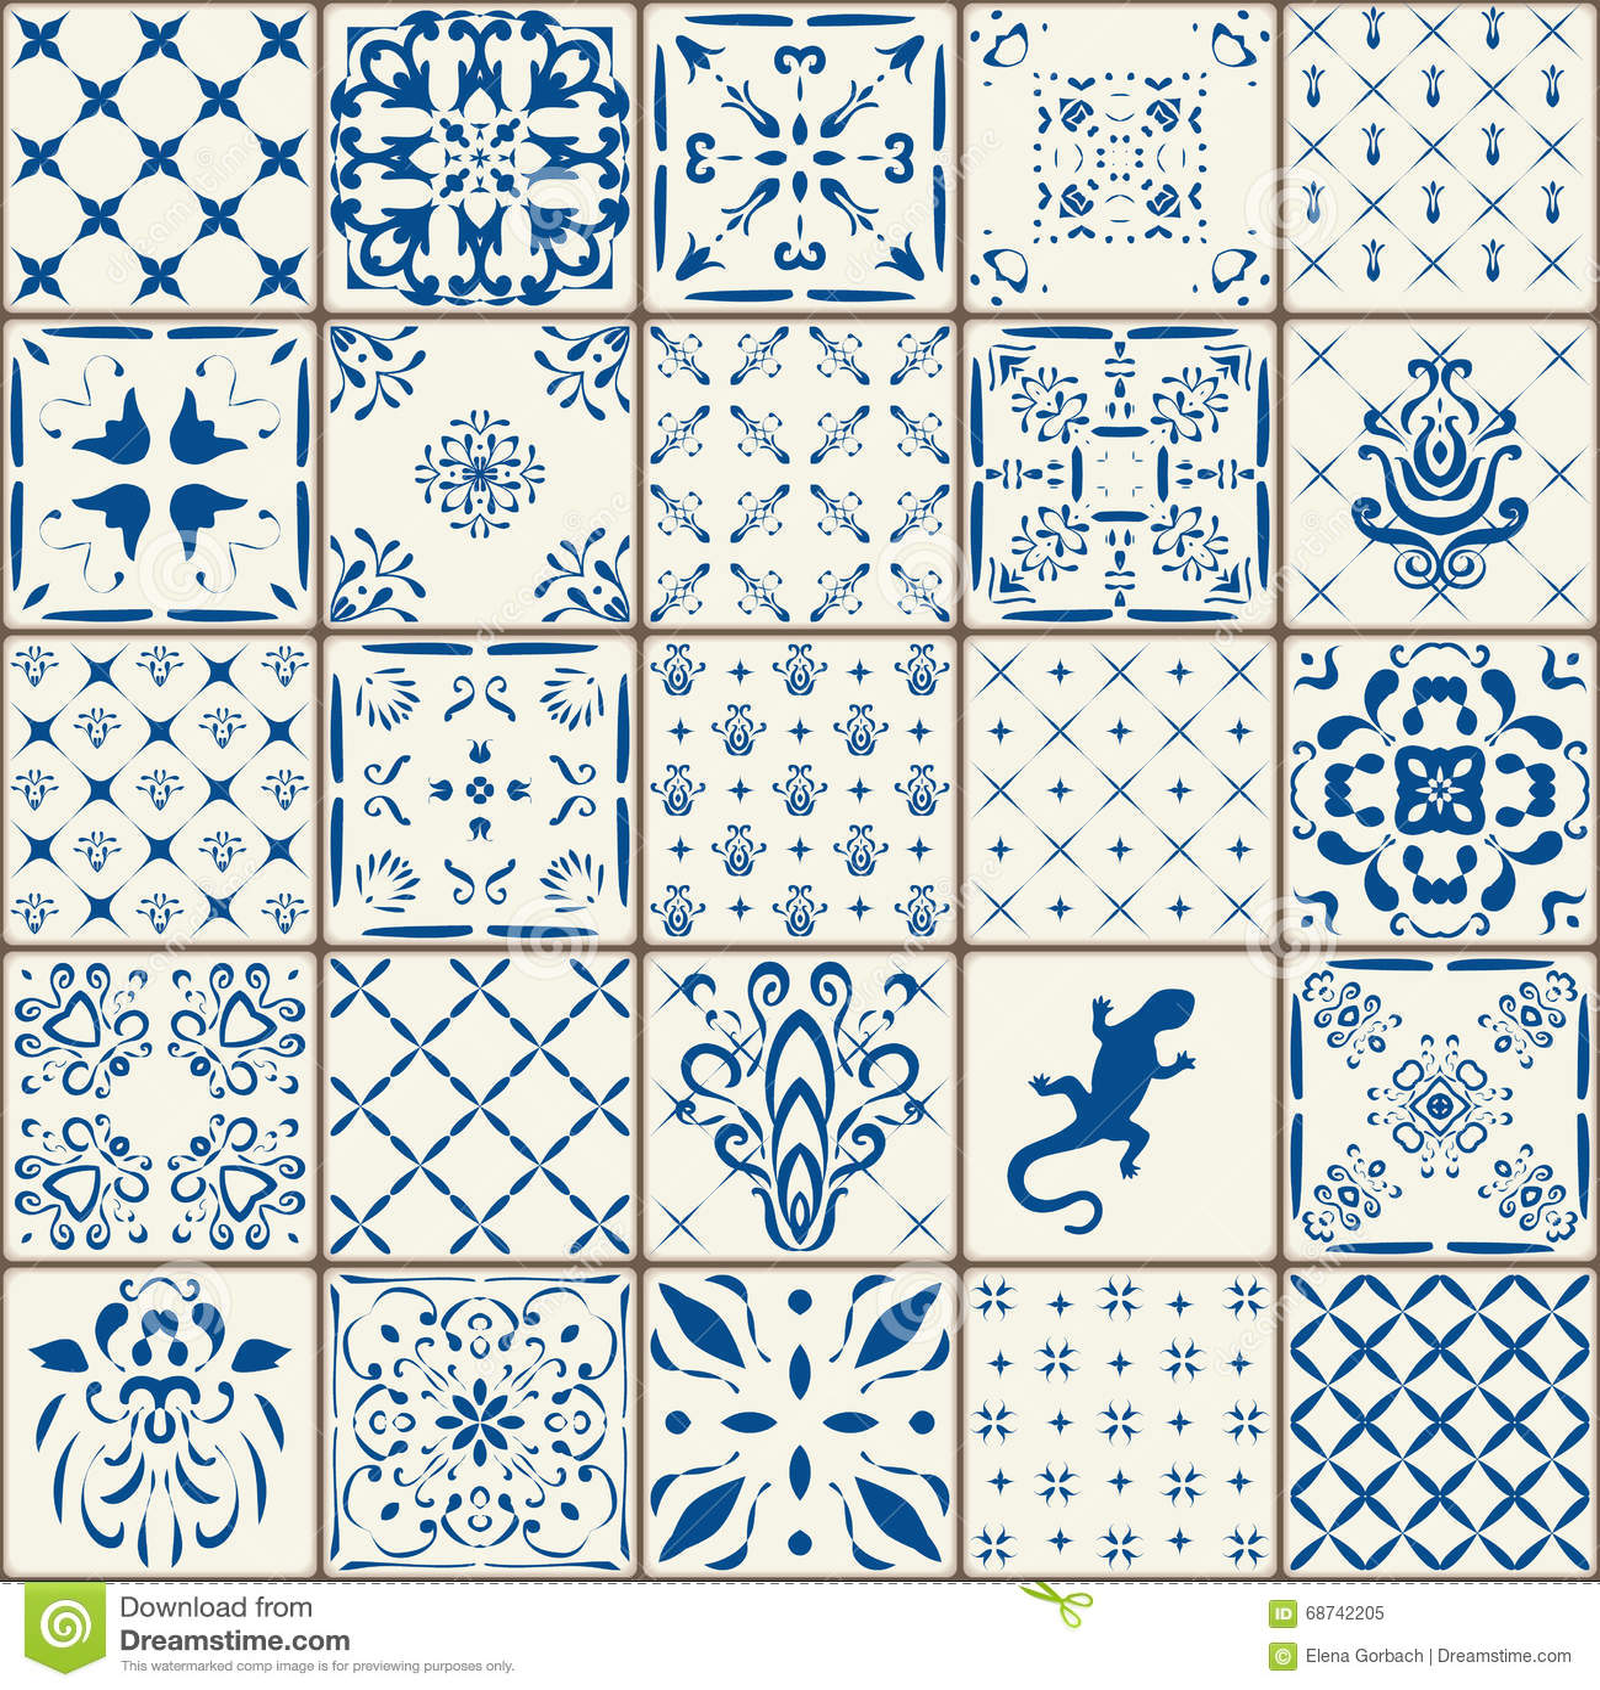 indigo blue tiles floor ornament collection gorgeous seamless patchwork pattern vintage. Black Bedroom Furniture Sets. Home Design Ideas